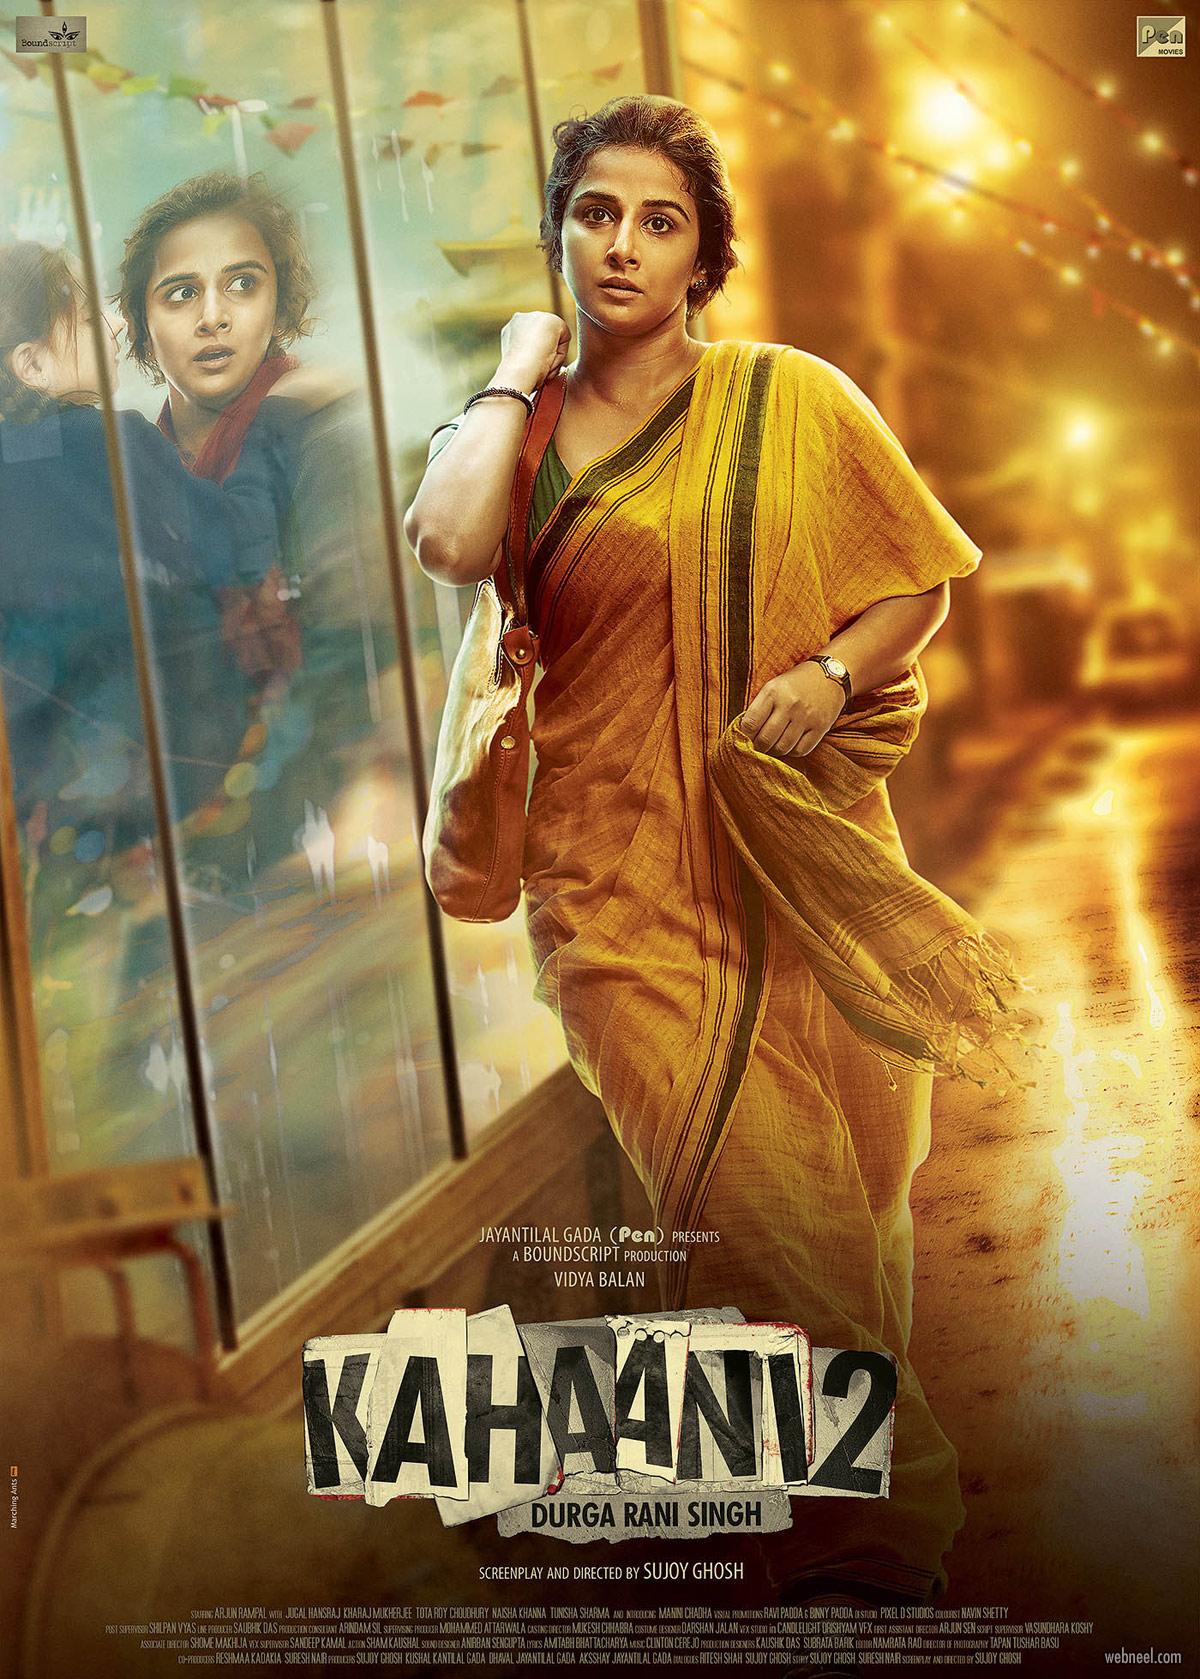 movie poster design kahaani2 bollywood hindi by prathoolnt